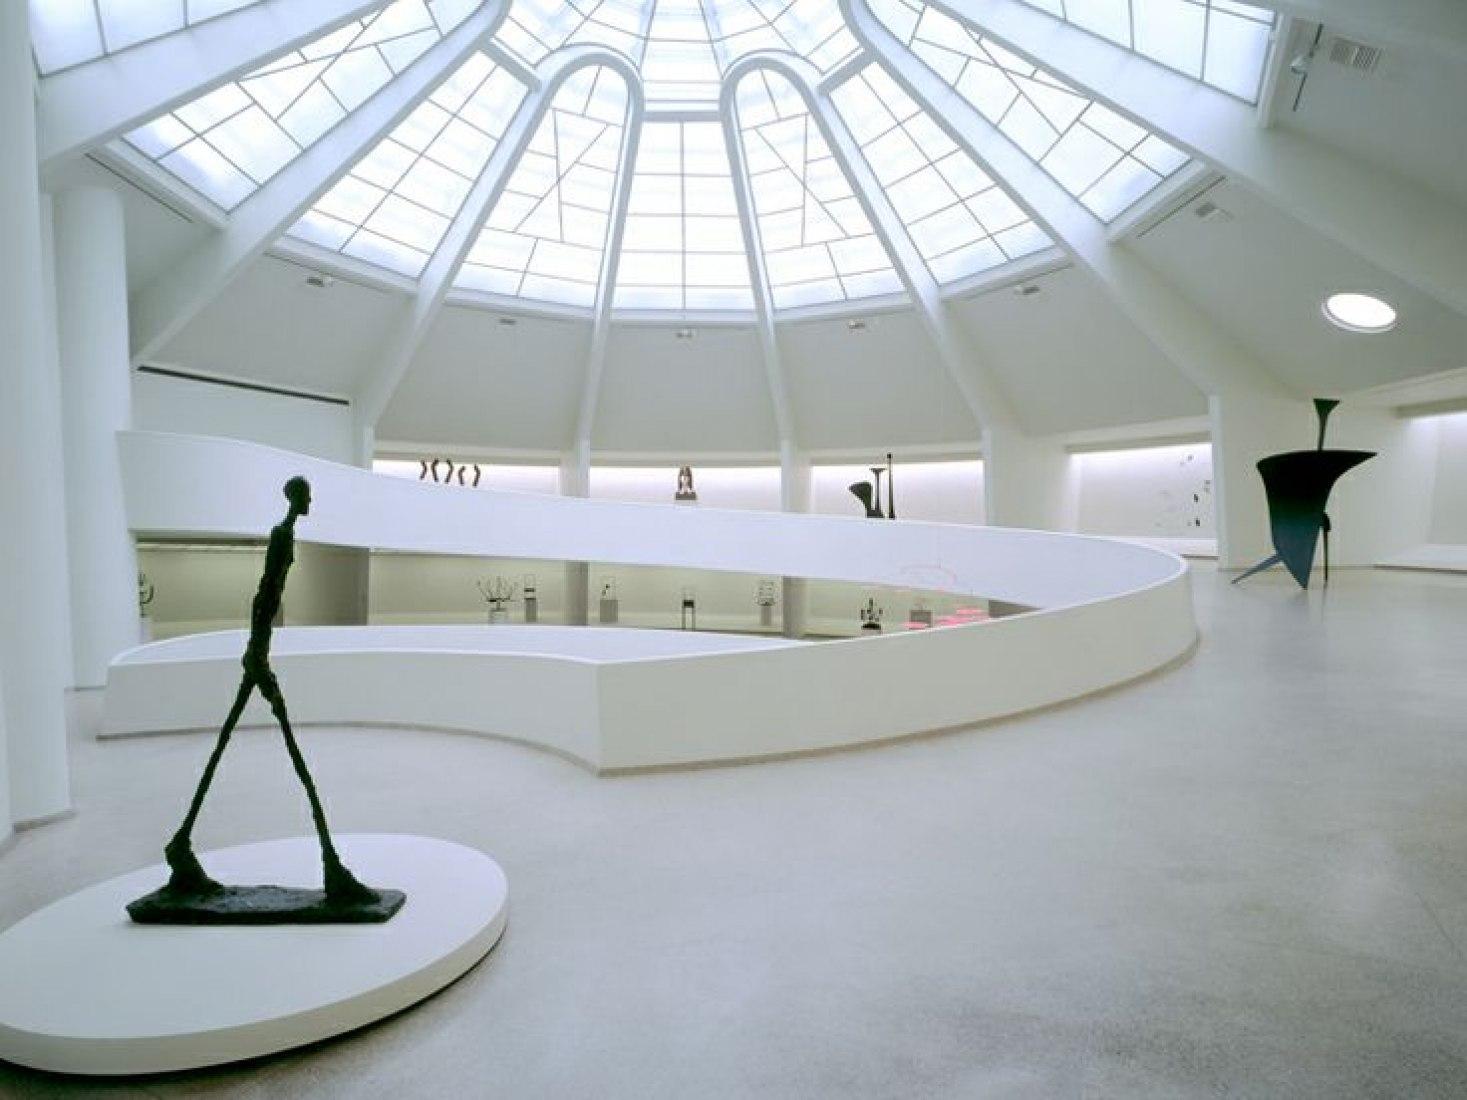 The Solomon R. Guggenheim interior. (Courtesy the Guggenheim Foundation).